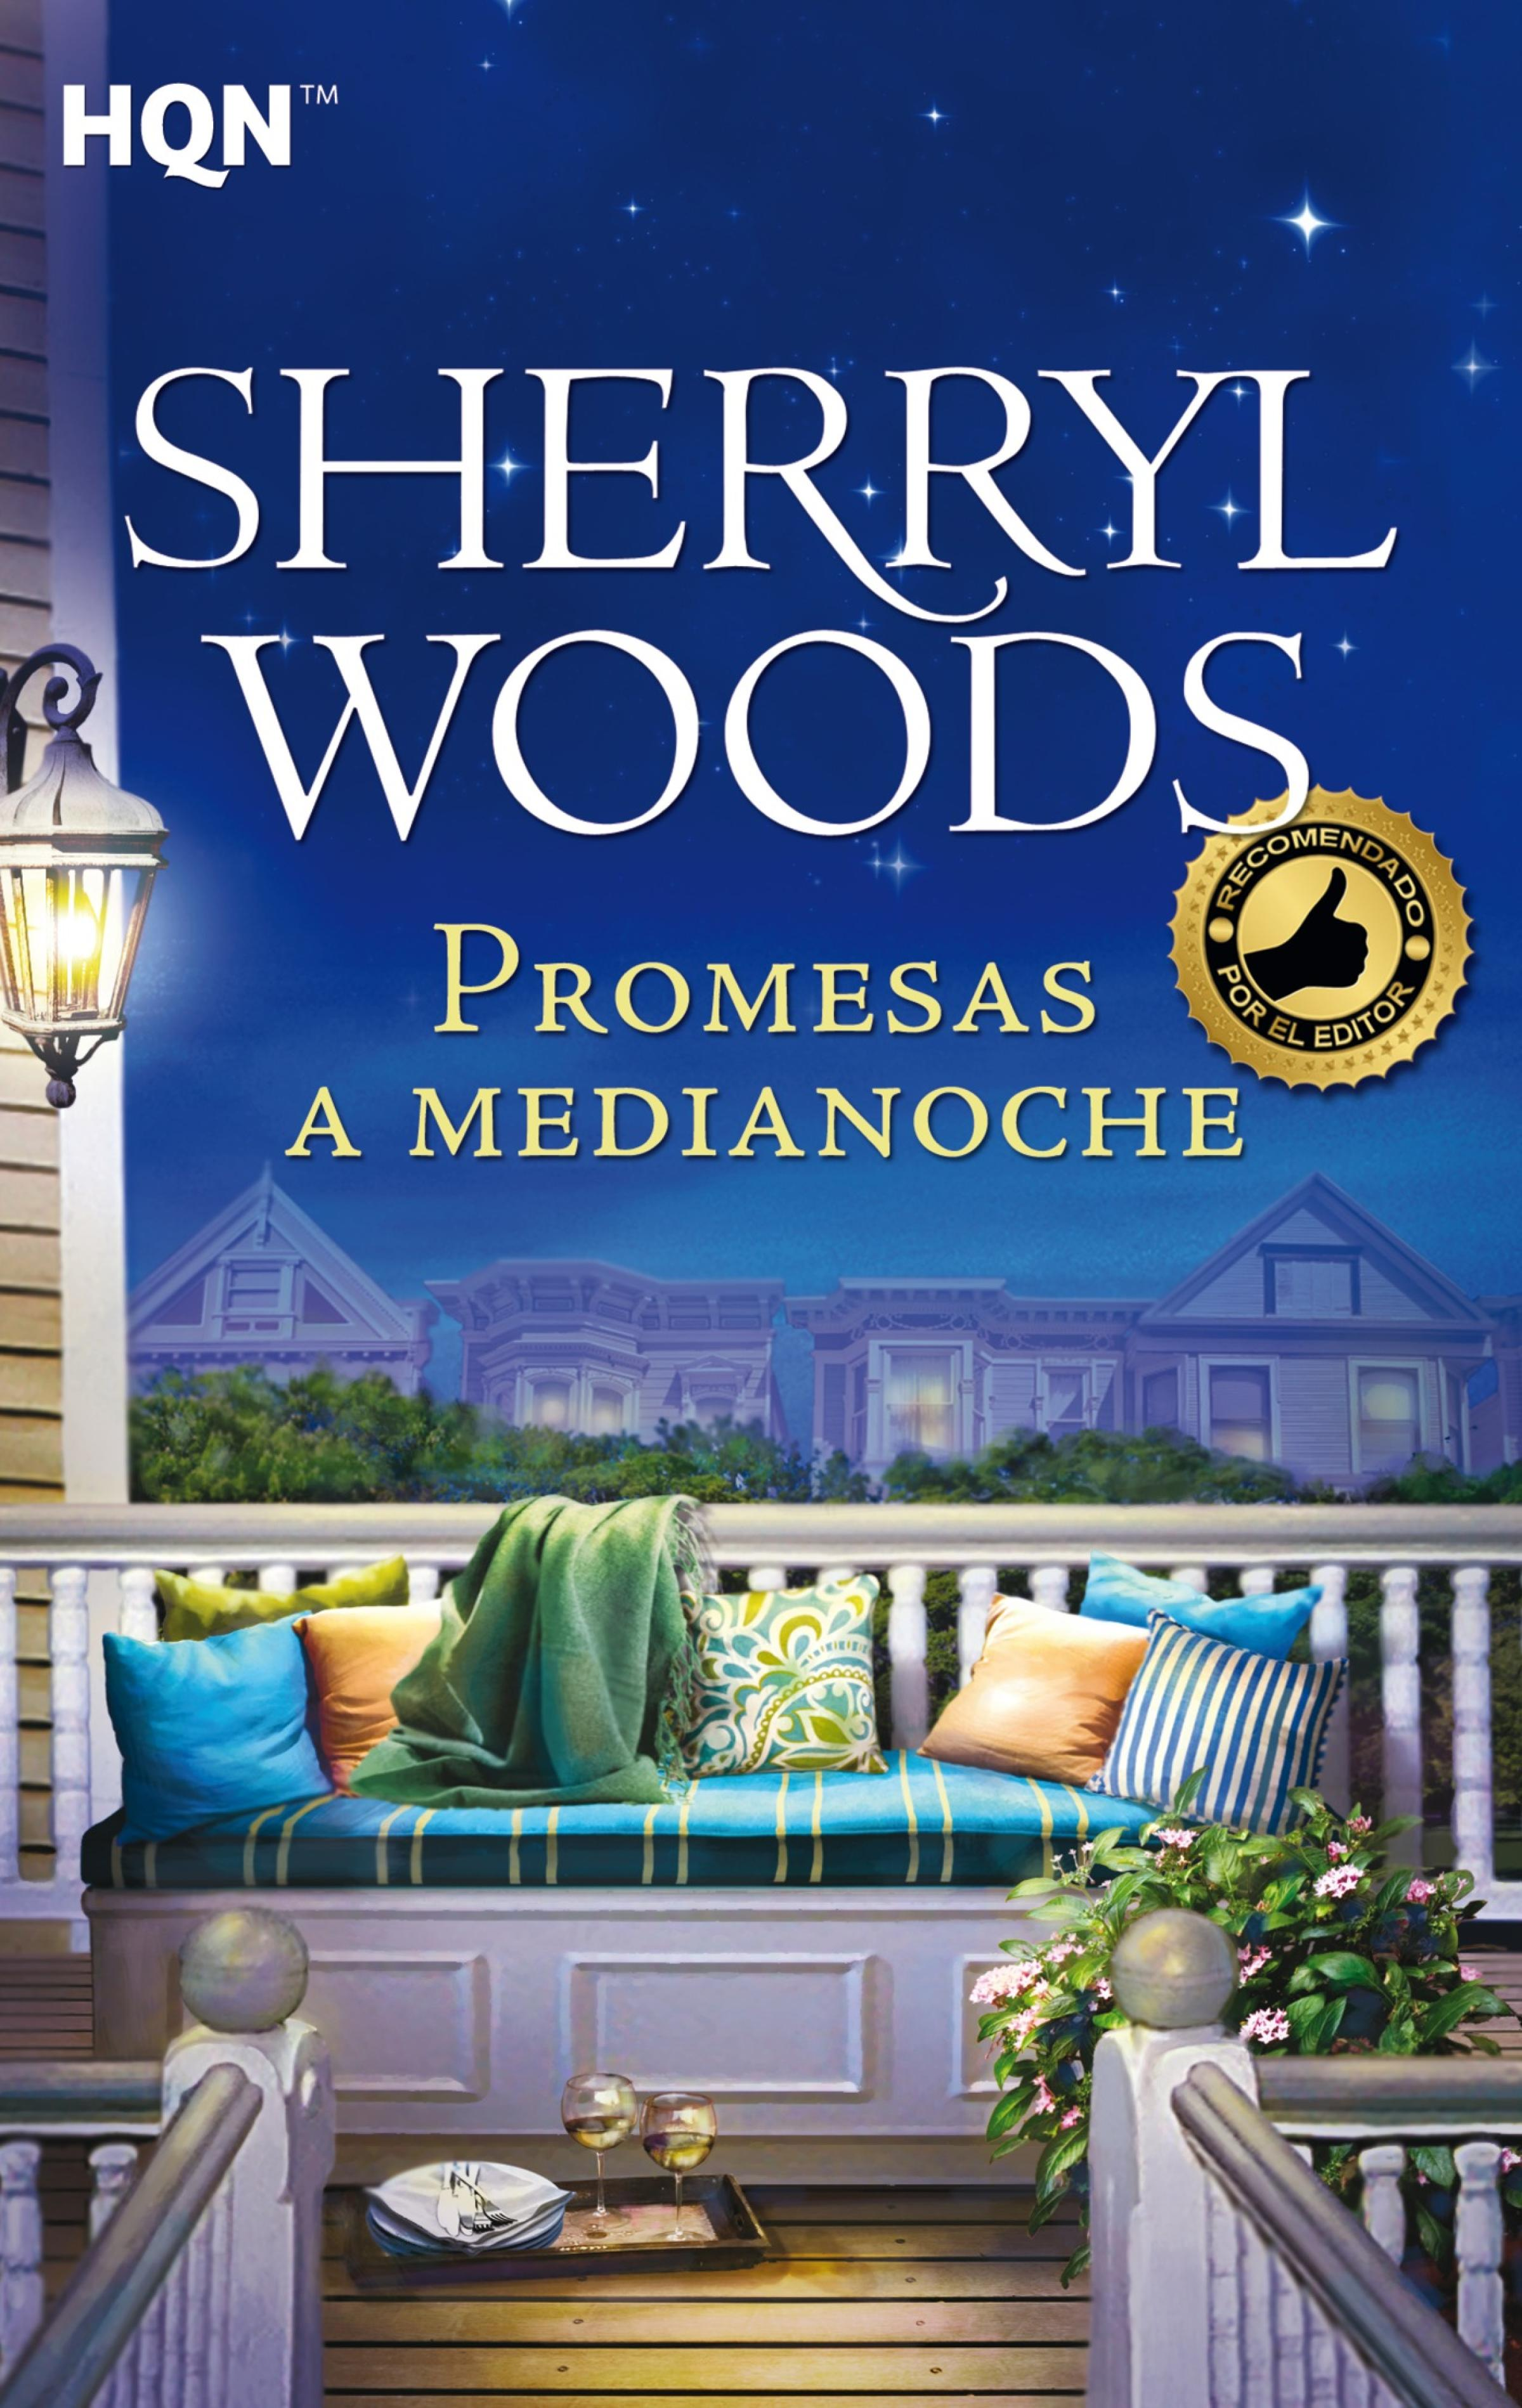 Sherryl Woods Promesas a medianoche недорого